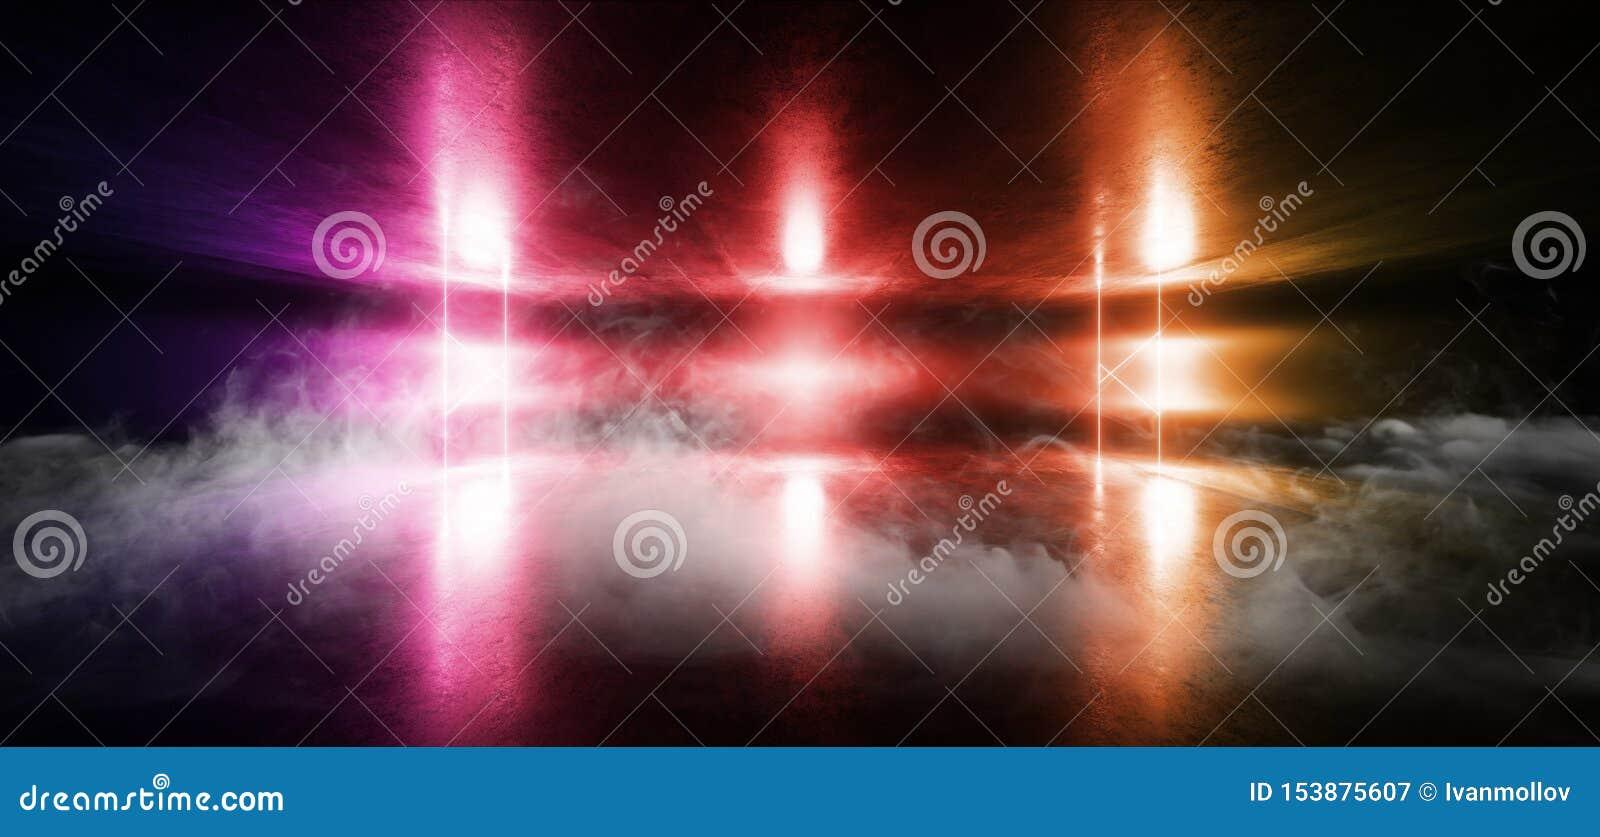 Smoke Sci Fi Neon Glowing Light Vibrant Red Purple Orange Stage NIght Club Background Grunge Concrete Dark Tunnel Hall Corridor